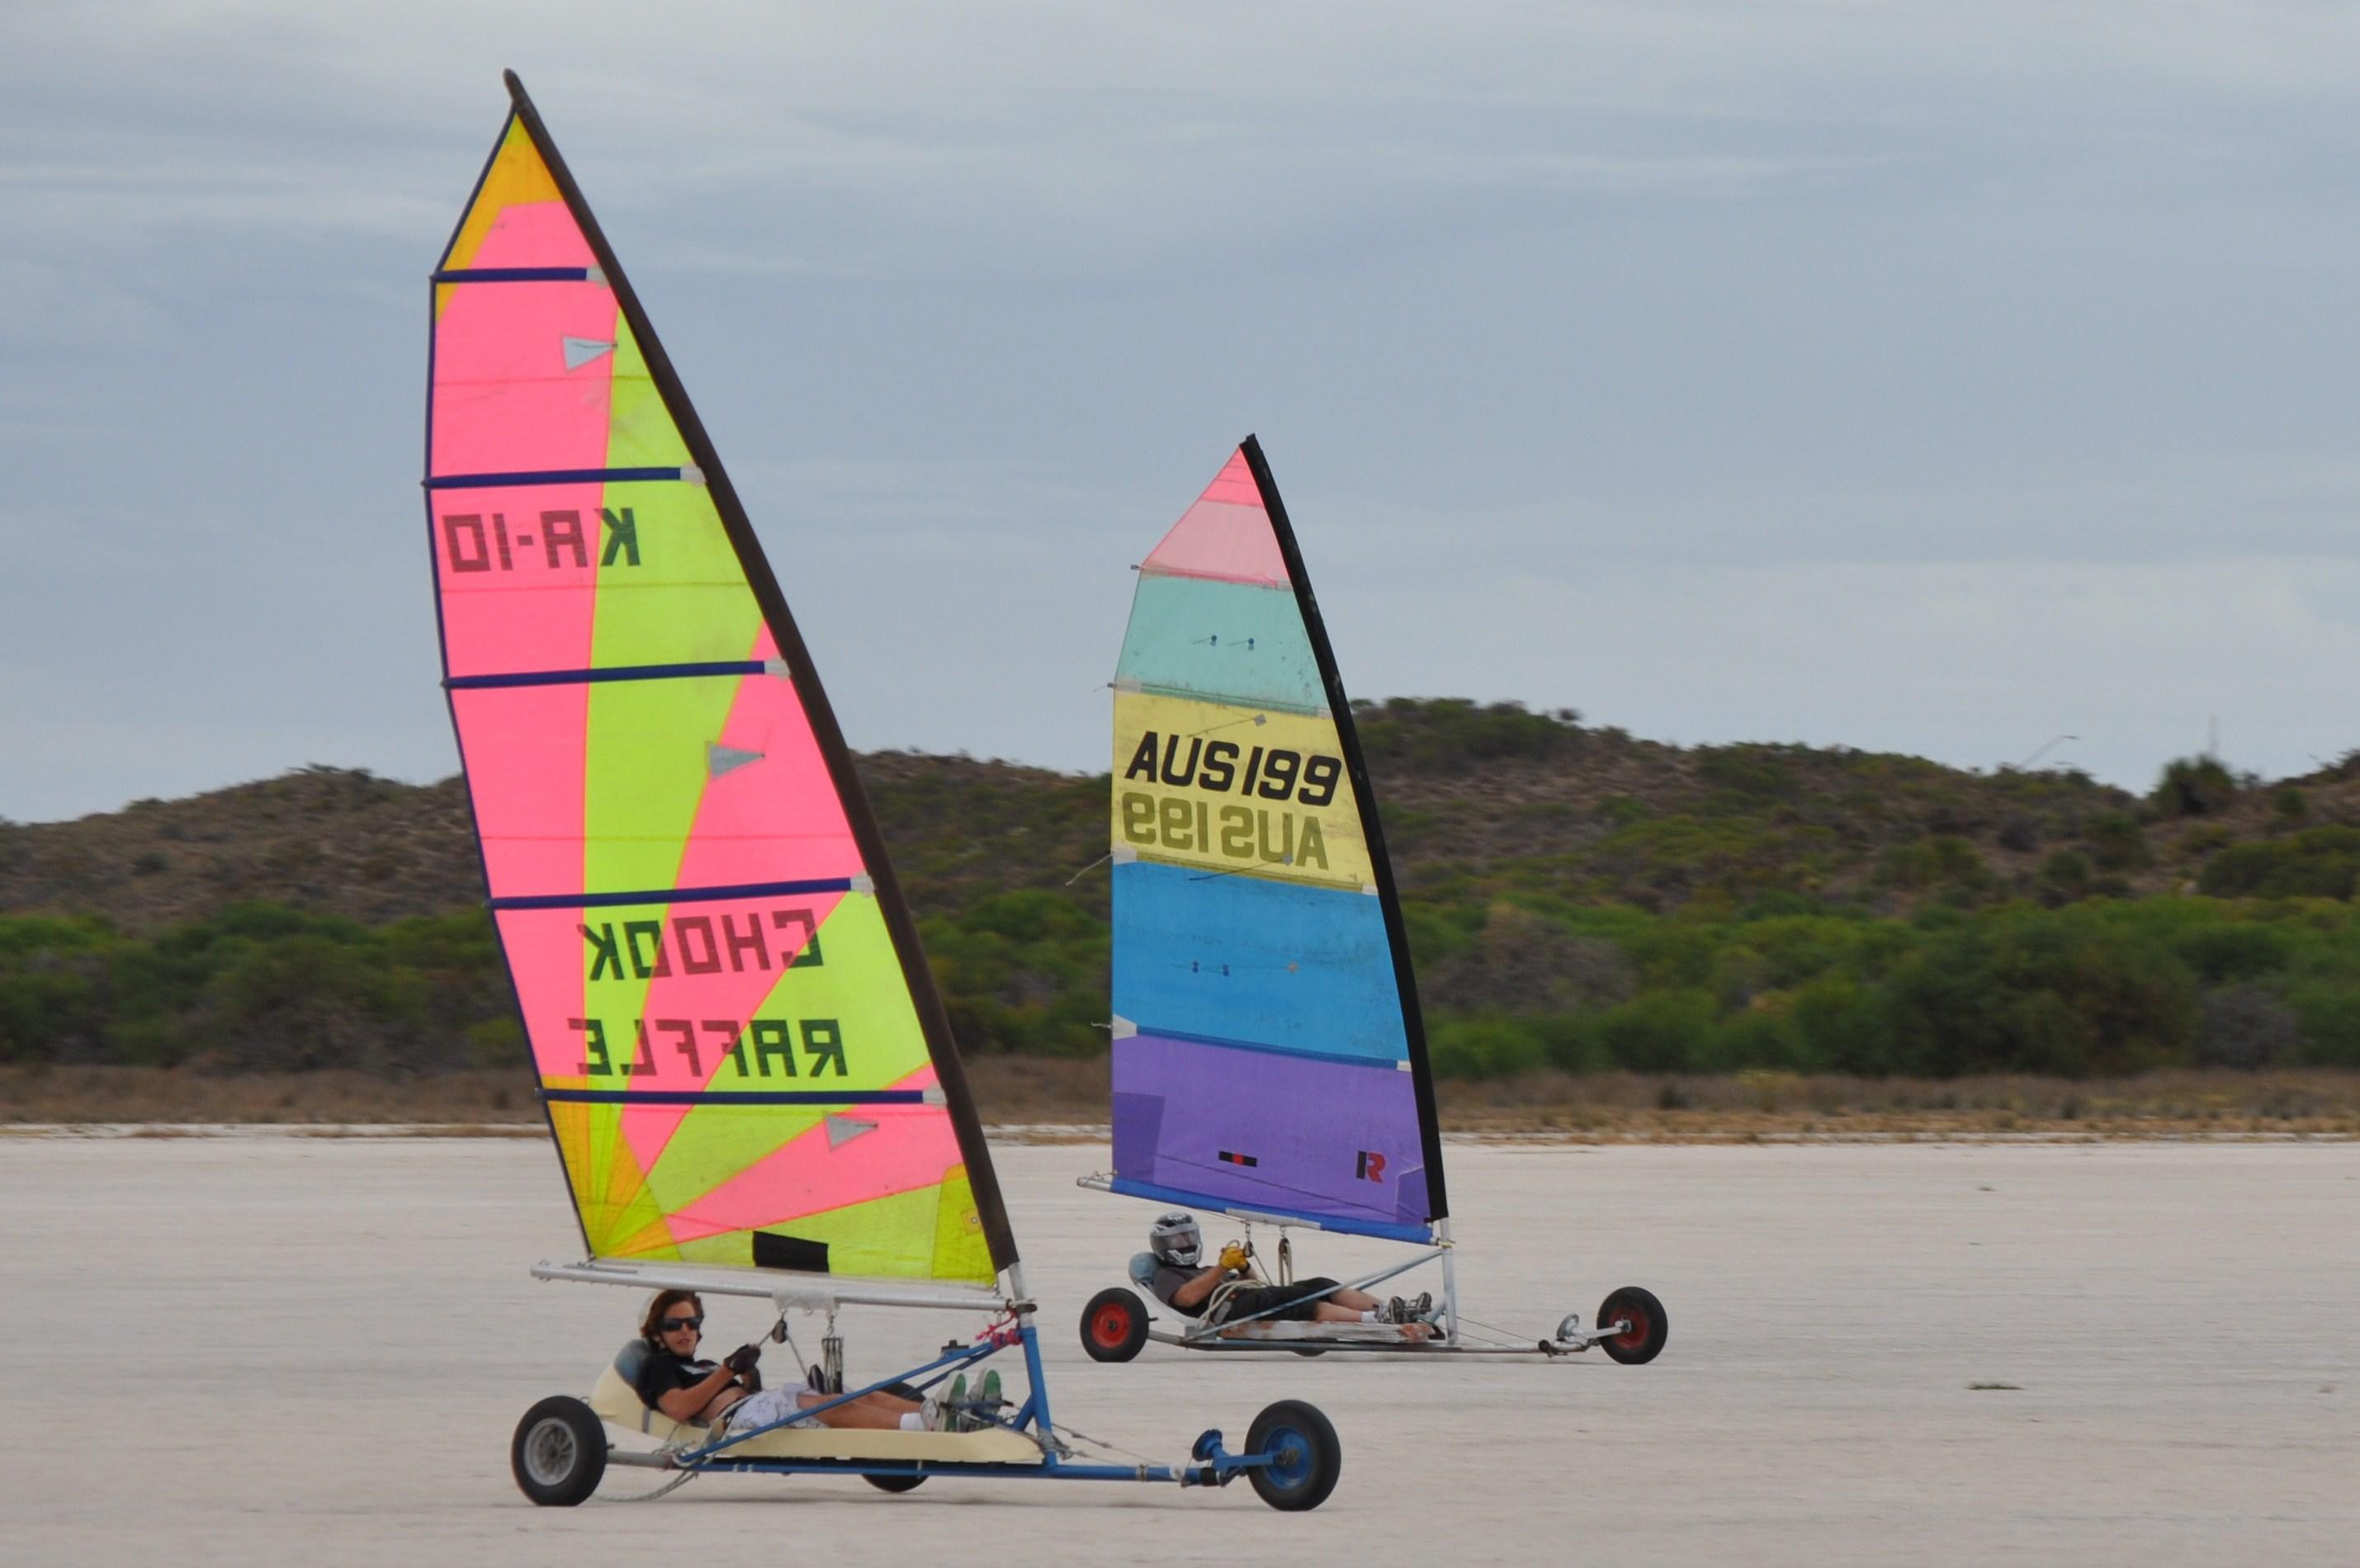 Sandgropers Land Yacht Club, Rockingham, Western Australia ...